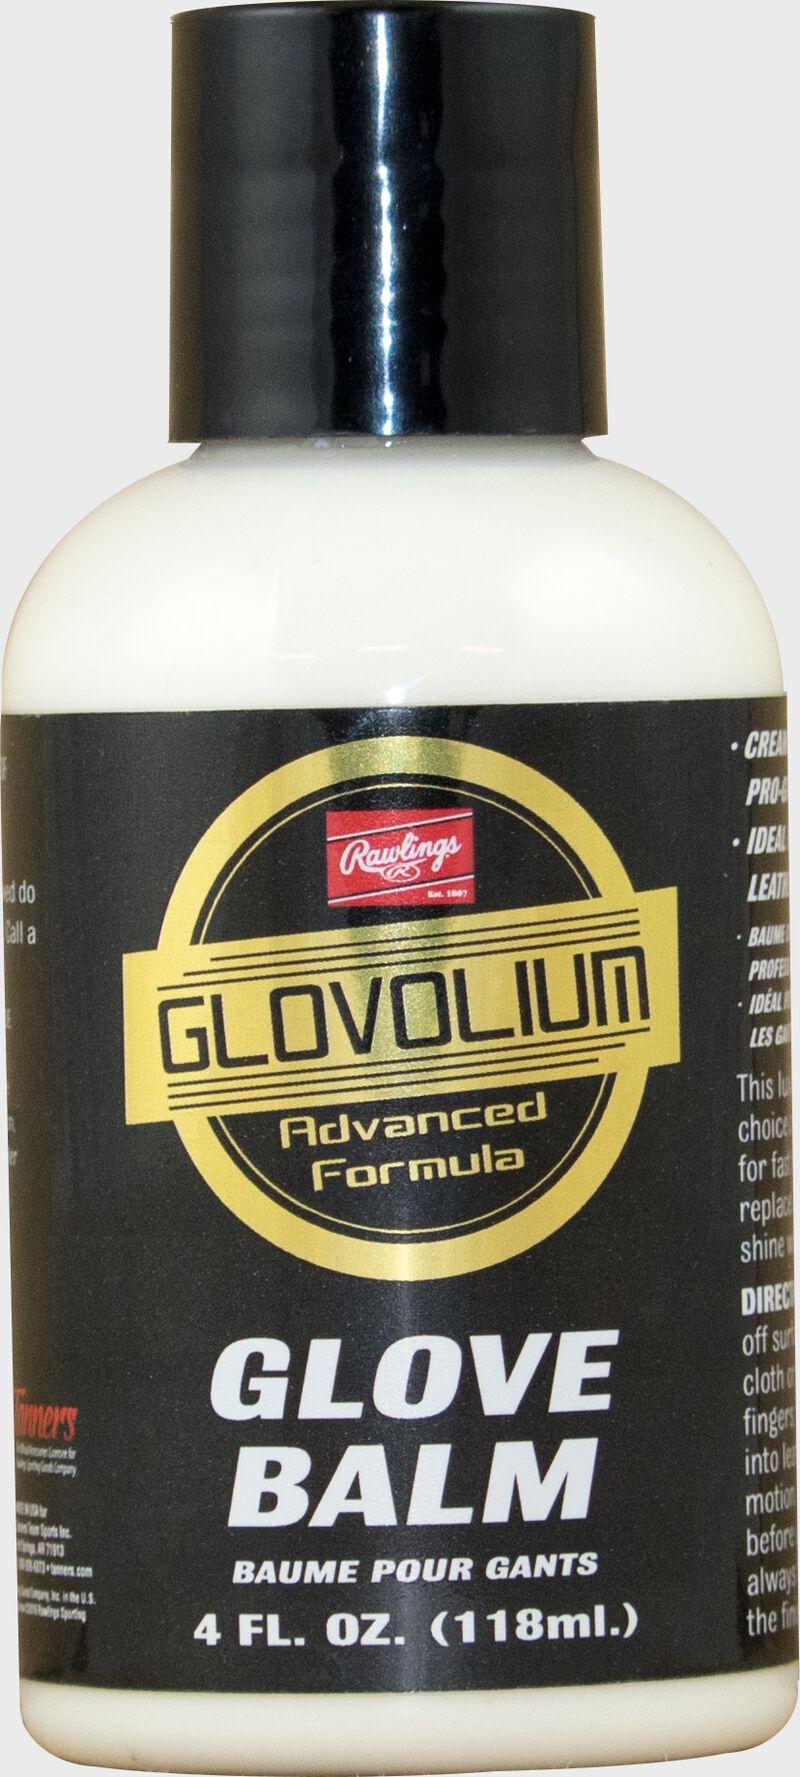 A bottle of Rawlings Glovolium Glove Balm for glove care and maintenance SKU #GLVBALM